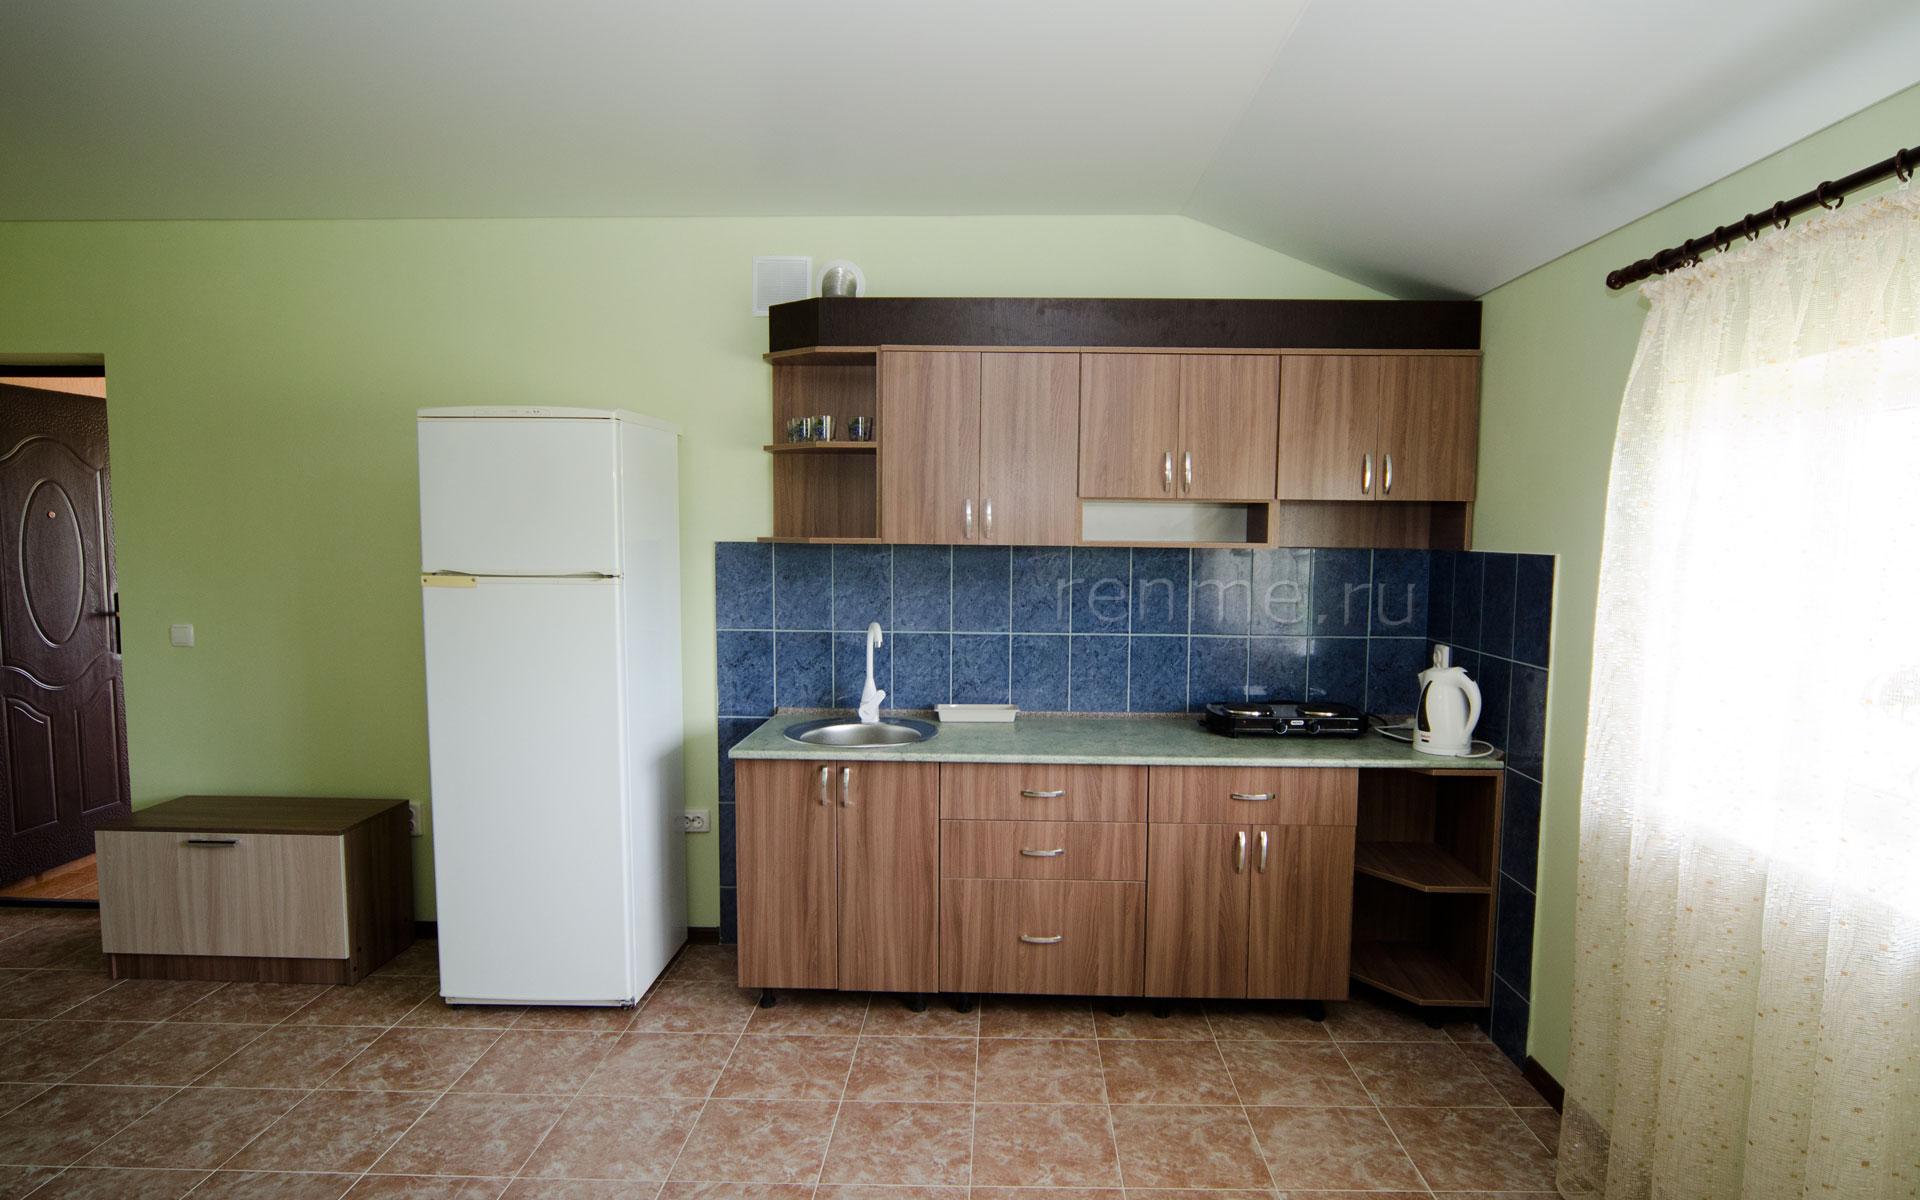 Кухня-студия. Двухкомнатная квартира-студия. Апарт-отель на ул. Гайдара. Заозёрное